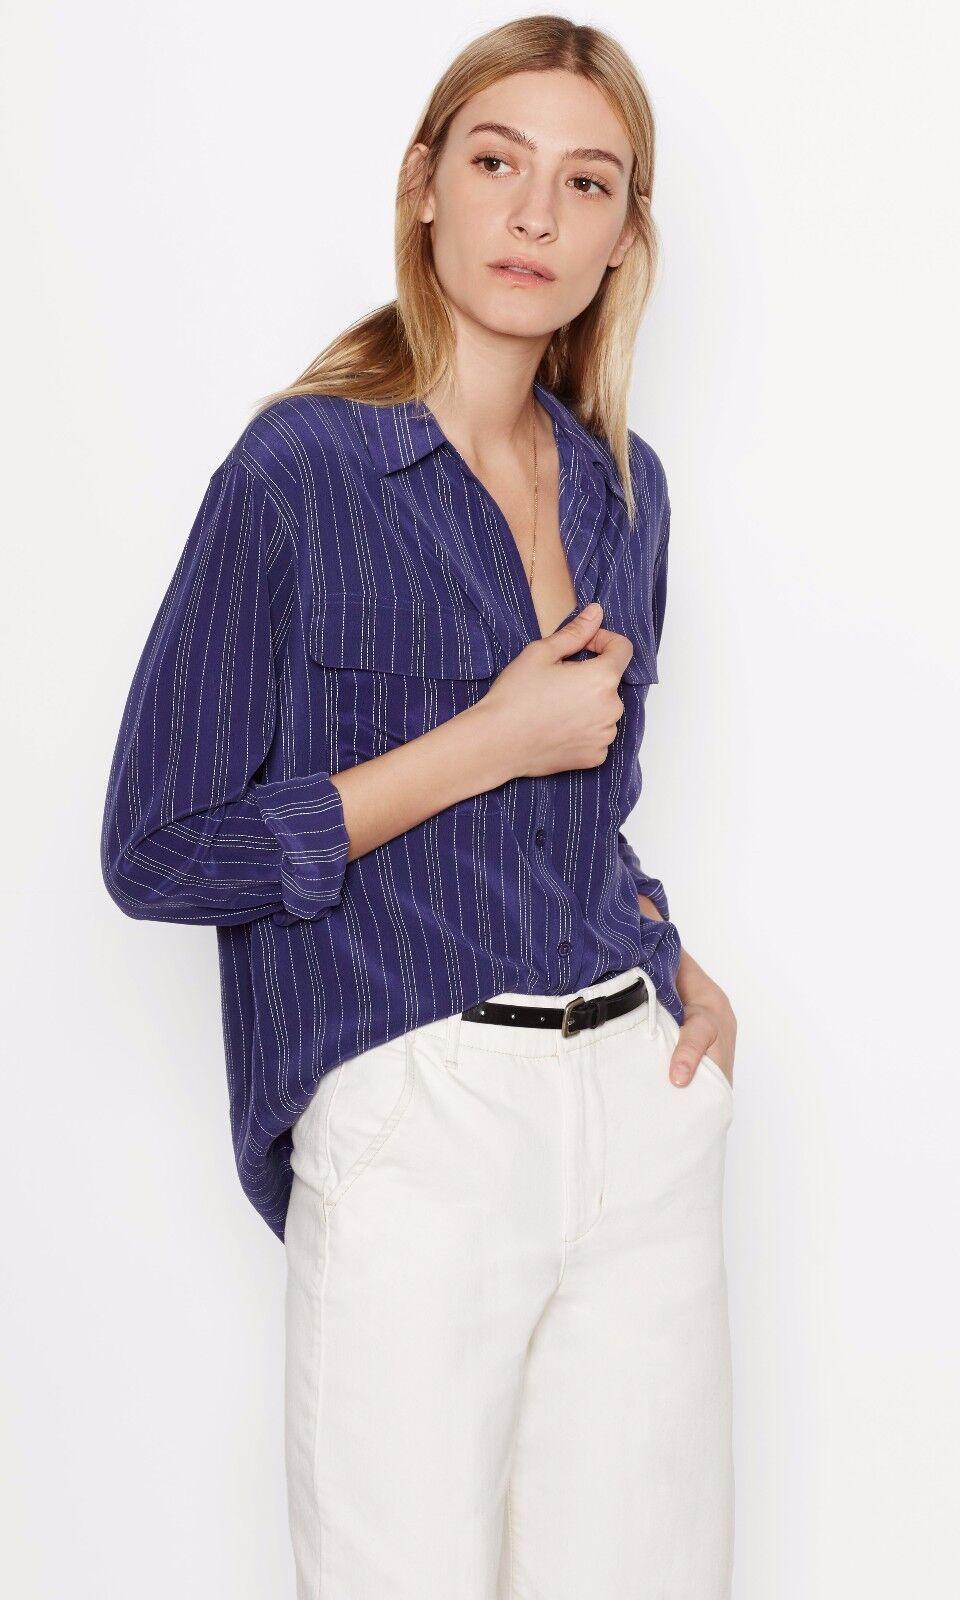 NWT Equipment Signature Stripe Silk Shirt Blouse Ultramarine Größe XS,S